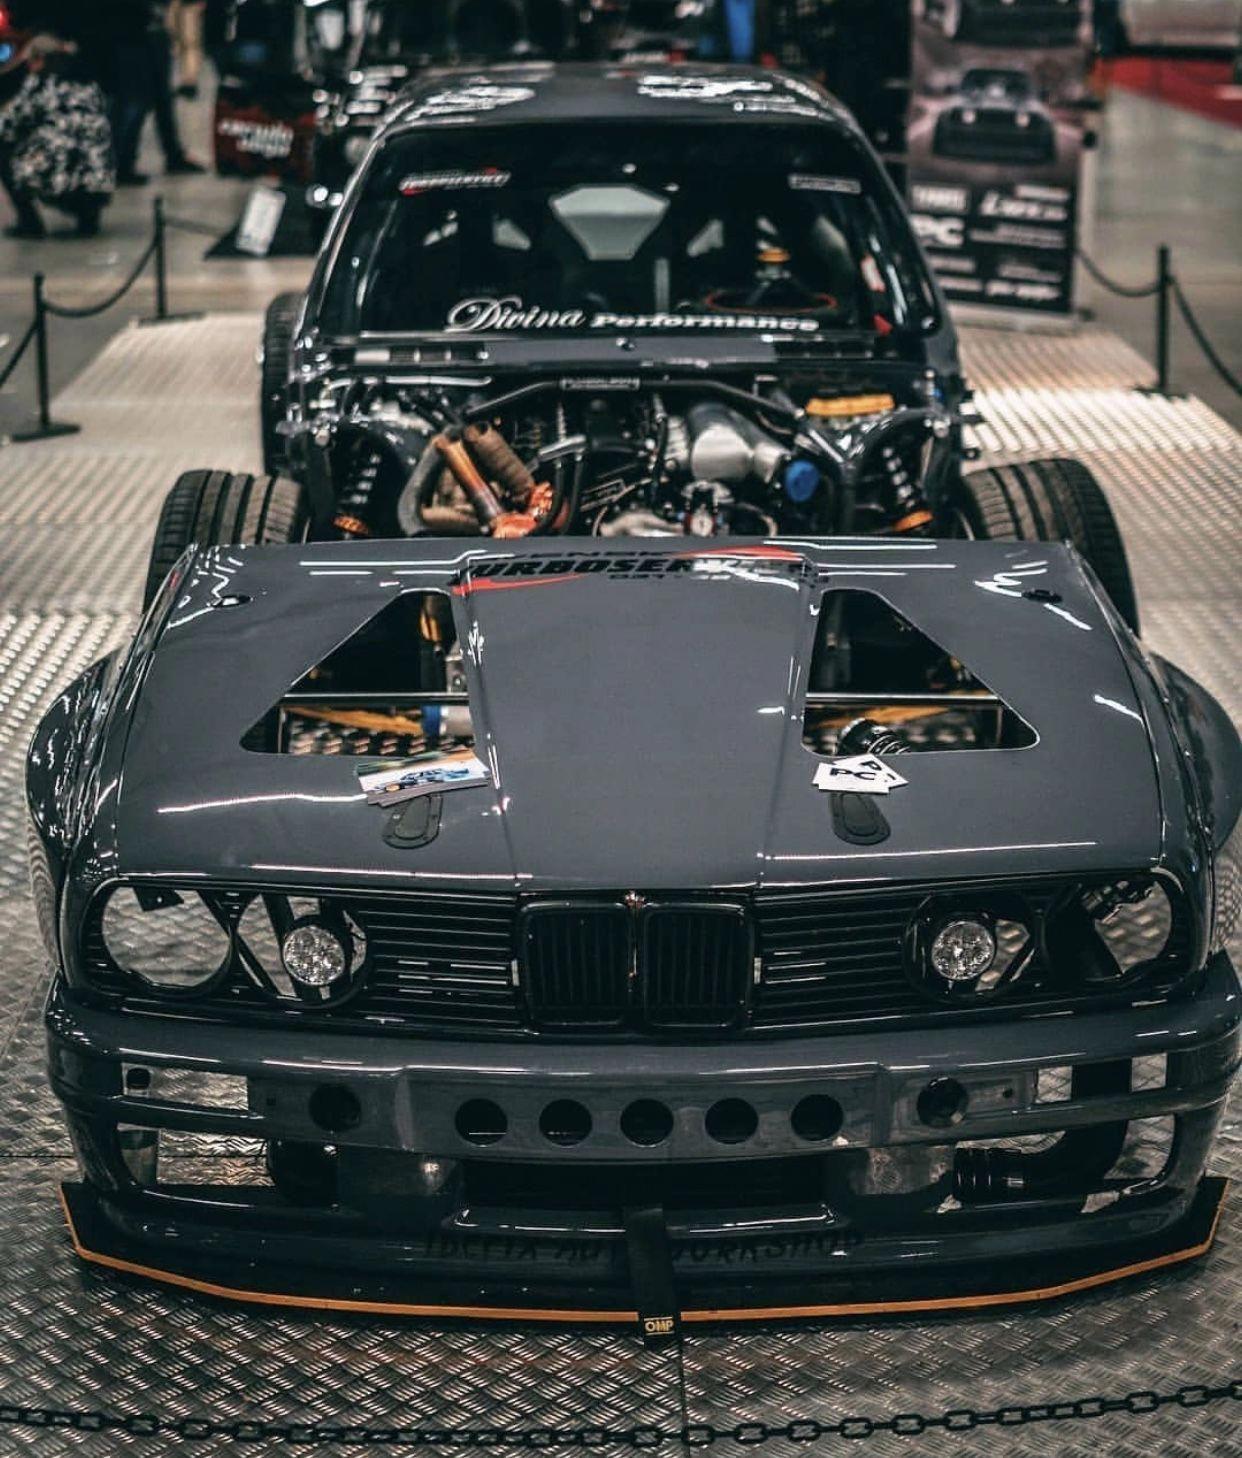 Classic Bmw Dallas Used Cars #BMWclassiccars